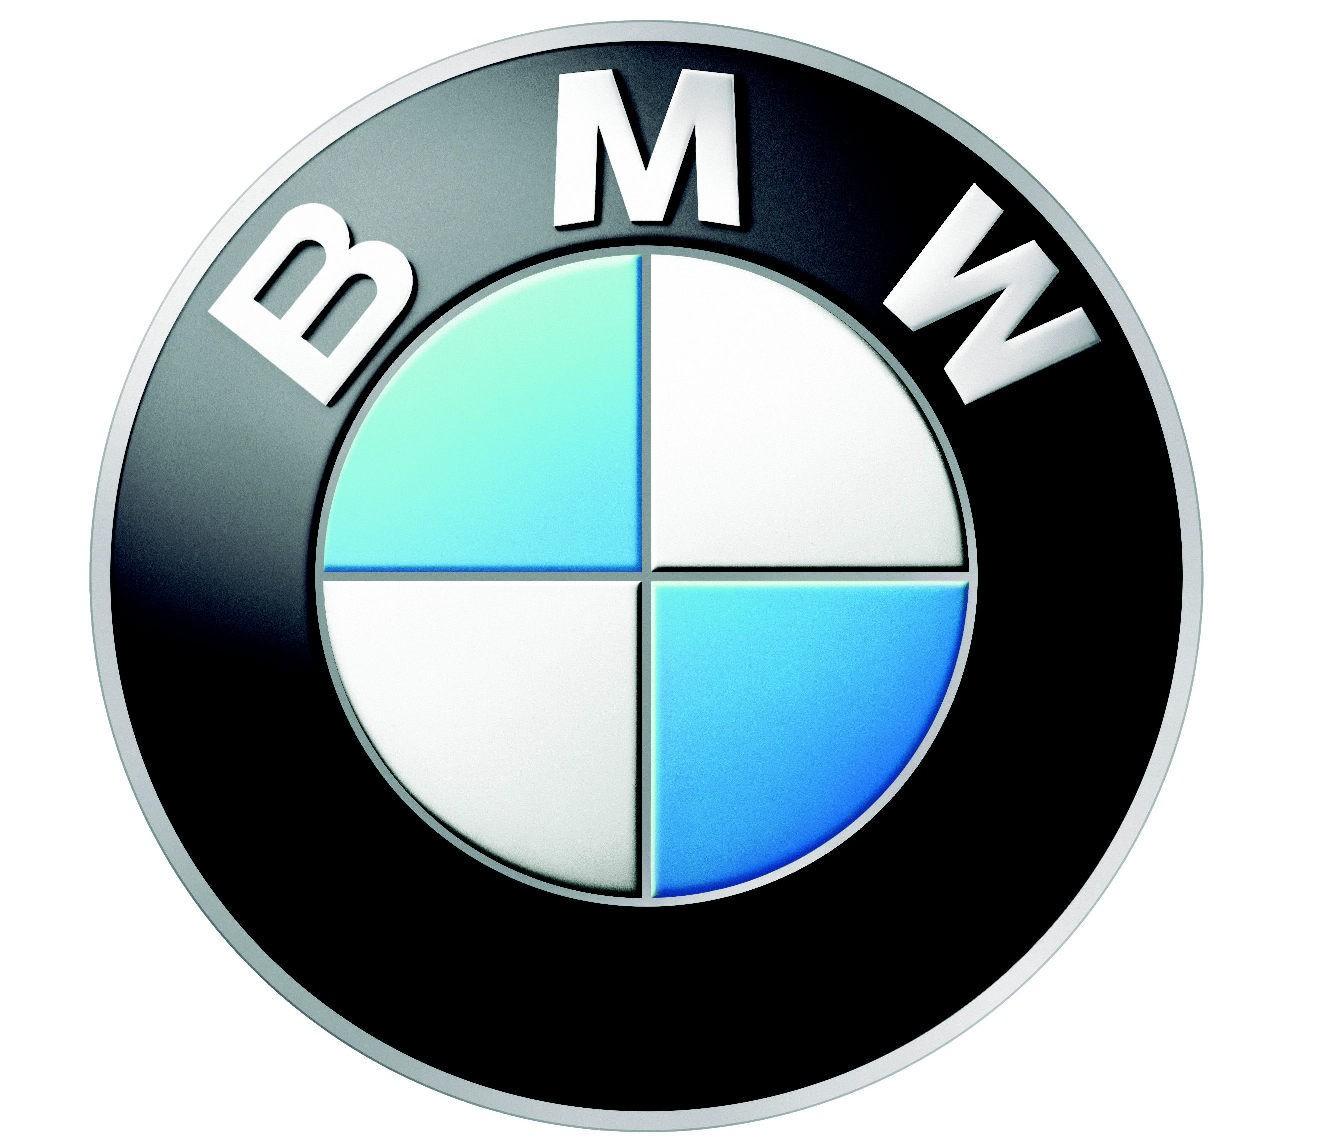 COLORI SPRAY ORIGINALI BMW METALLIZZATI STORICI E MODERNI (PARTE 2)  (da A02 a X10)